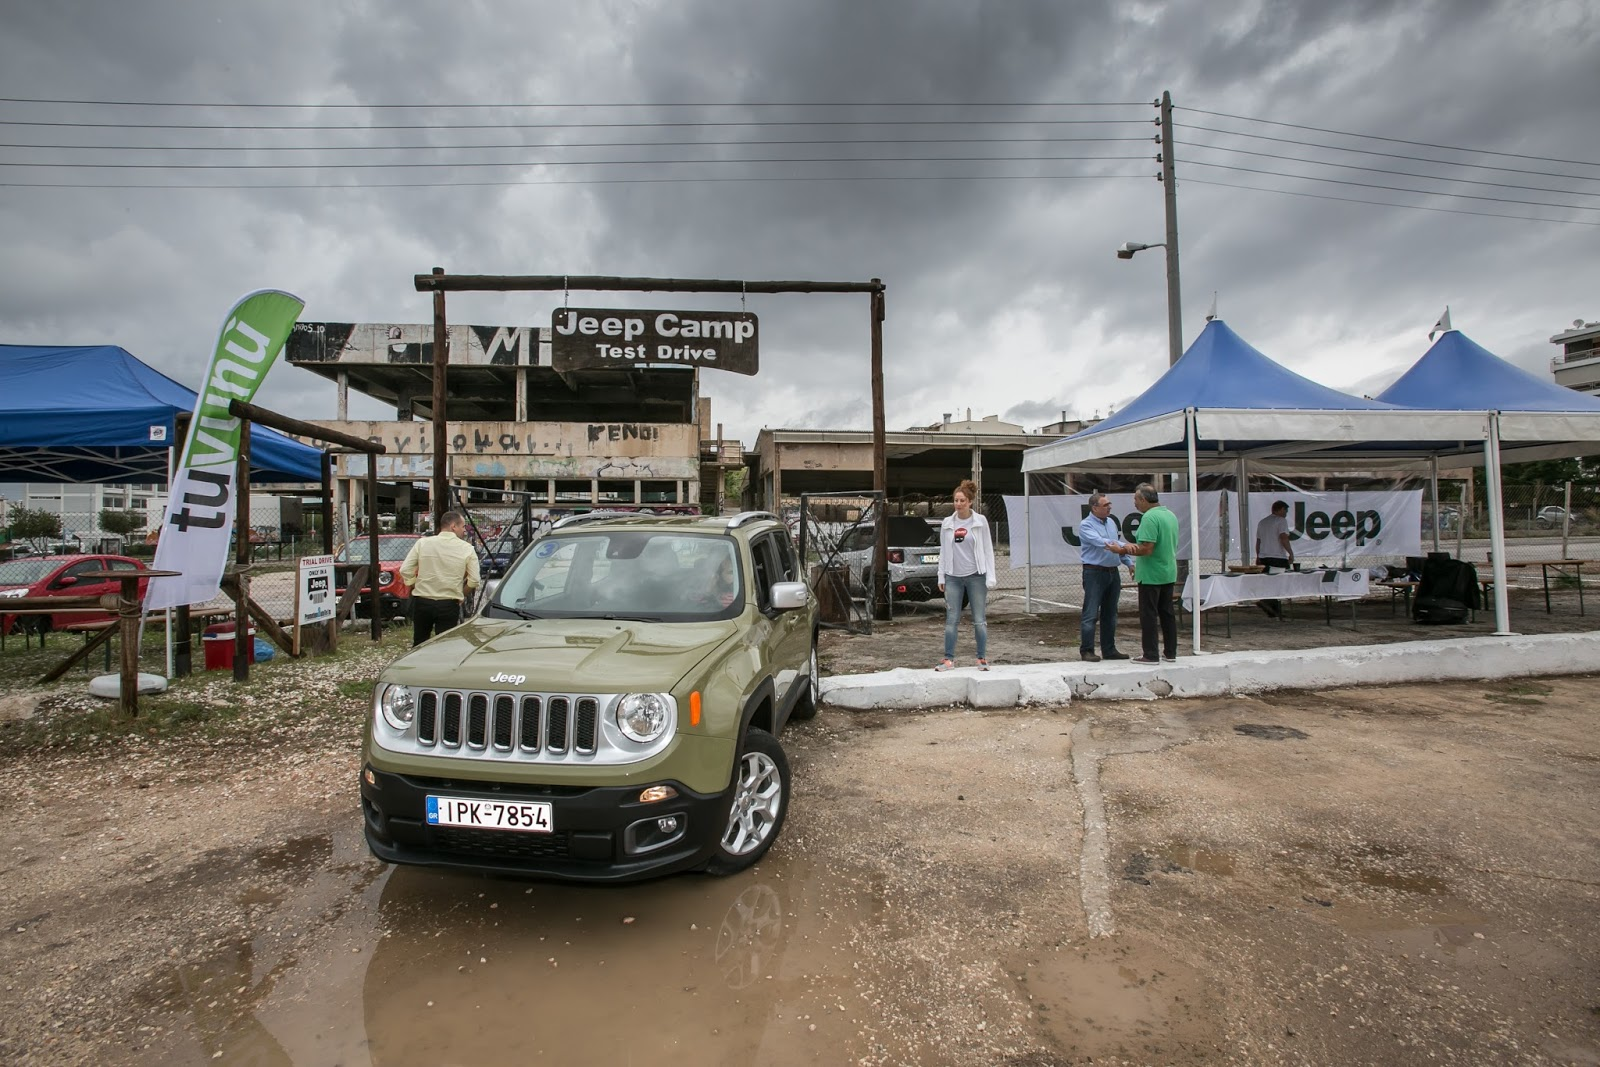 JEEP%2BCAMP GK 0234 Πετάμε ένα Jeep Renegade σε λάσπες, πέτρες, άμμο, λίμνες. Θα τα καταφέρει; Jeep, Jeep Renegade, Renegade, SUV, TEST, zblog, ΔΟΚΙΜΕΣ